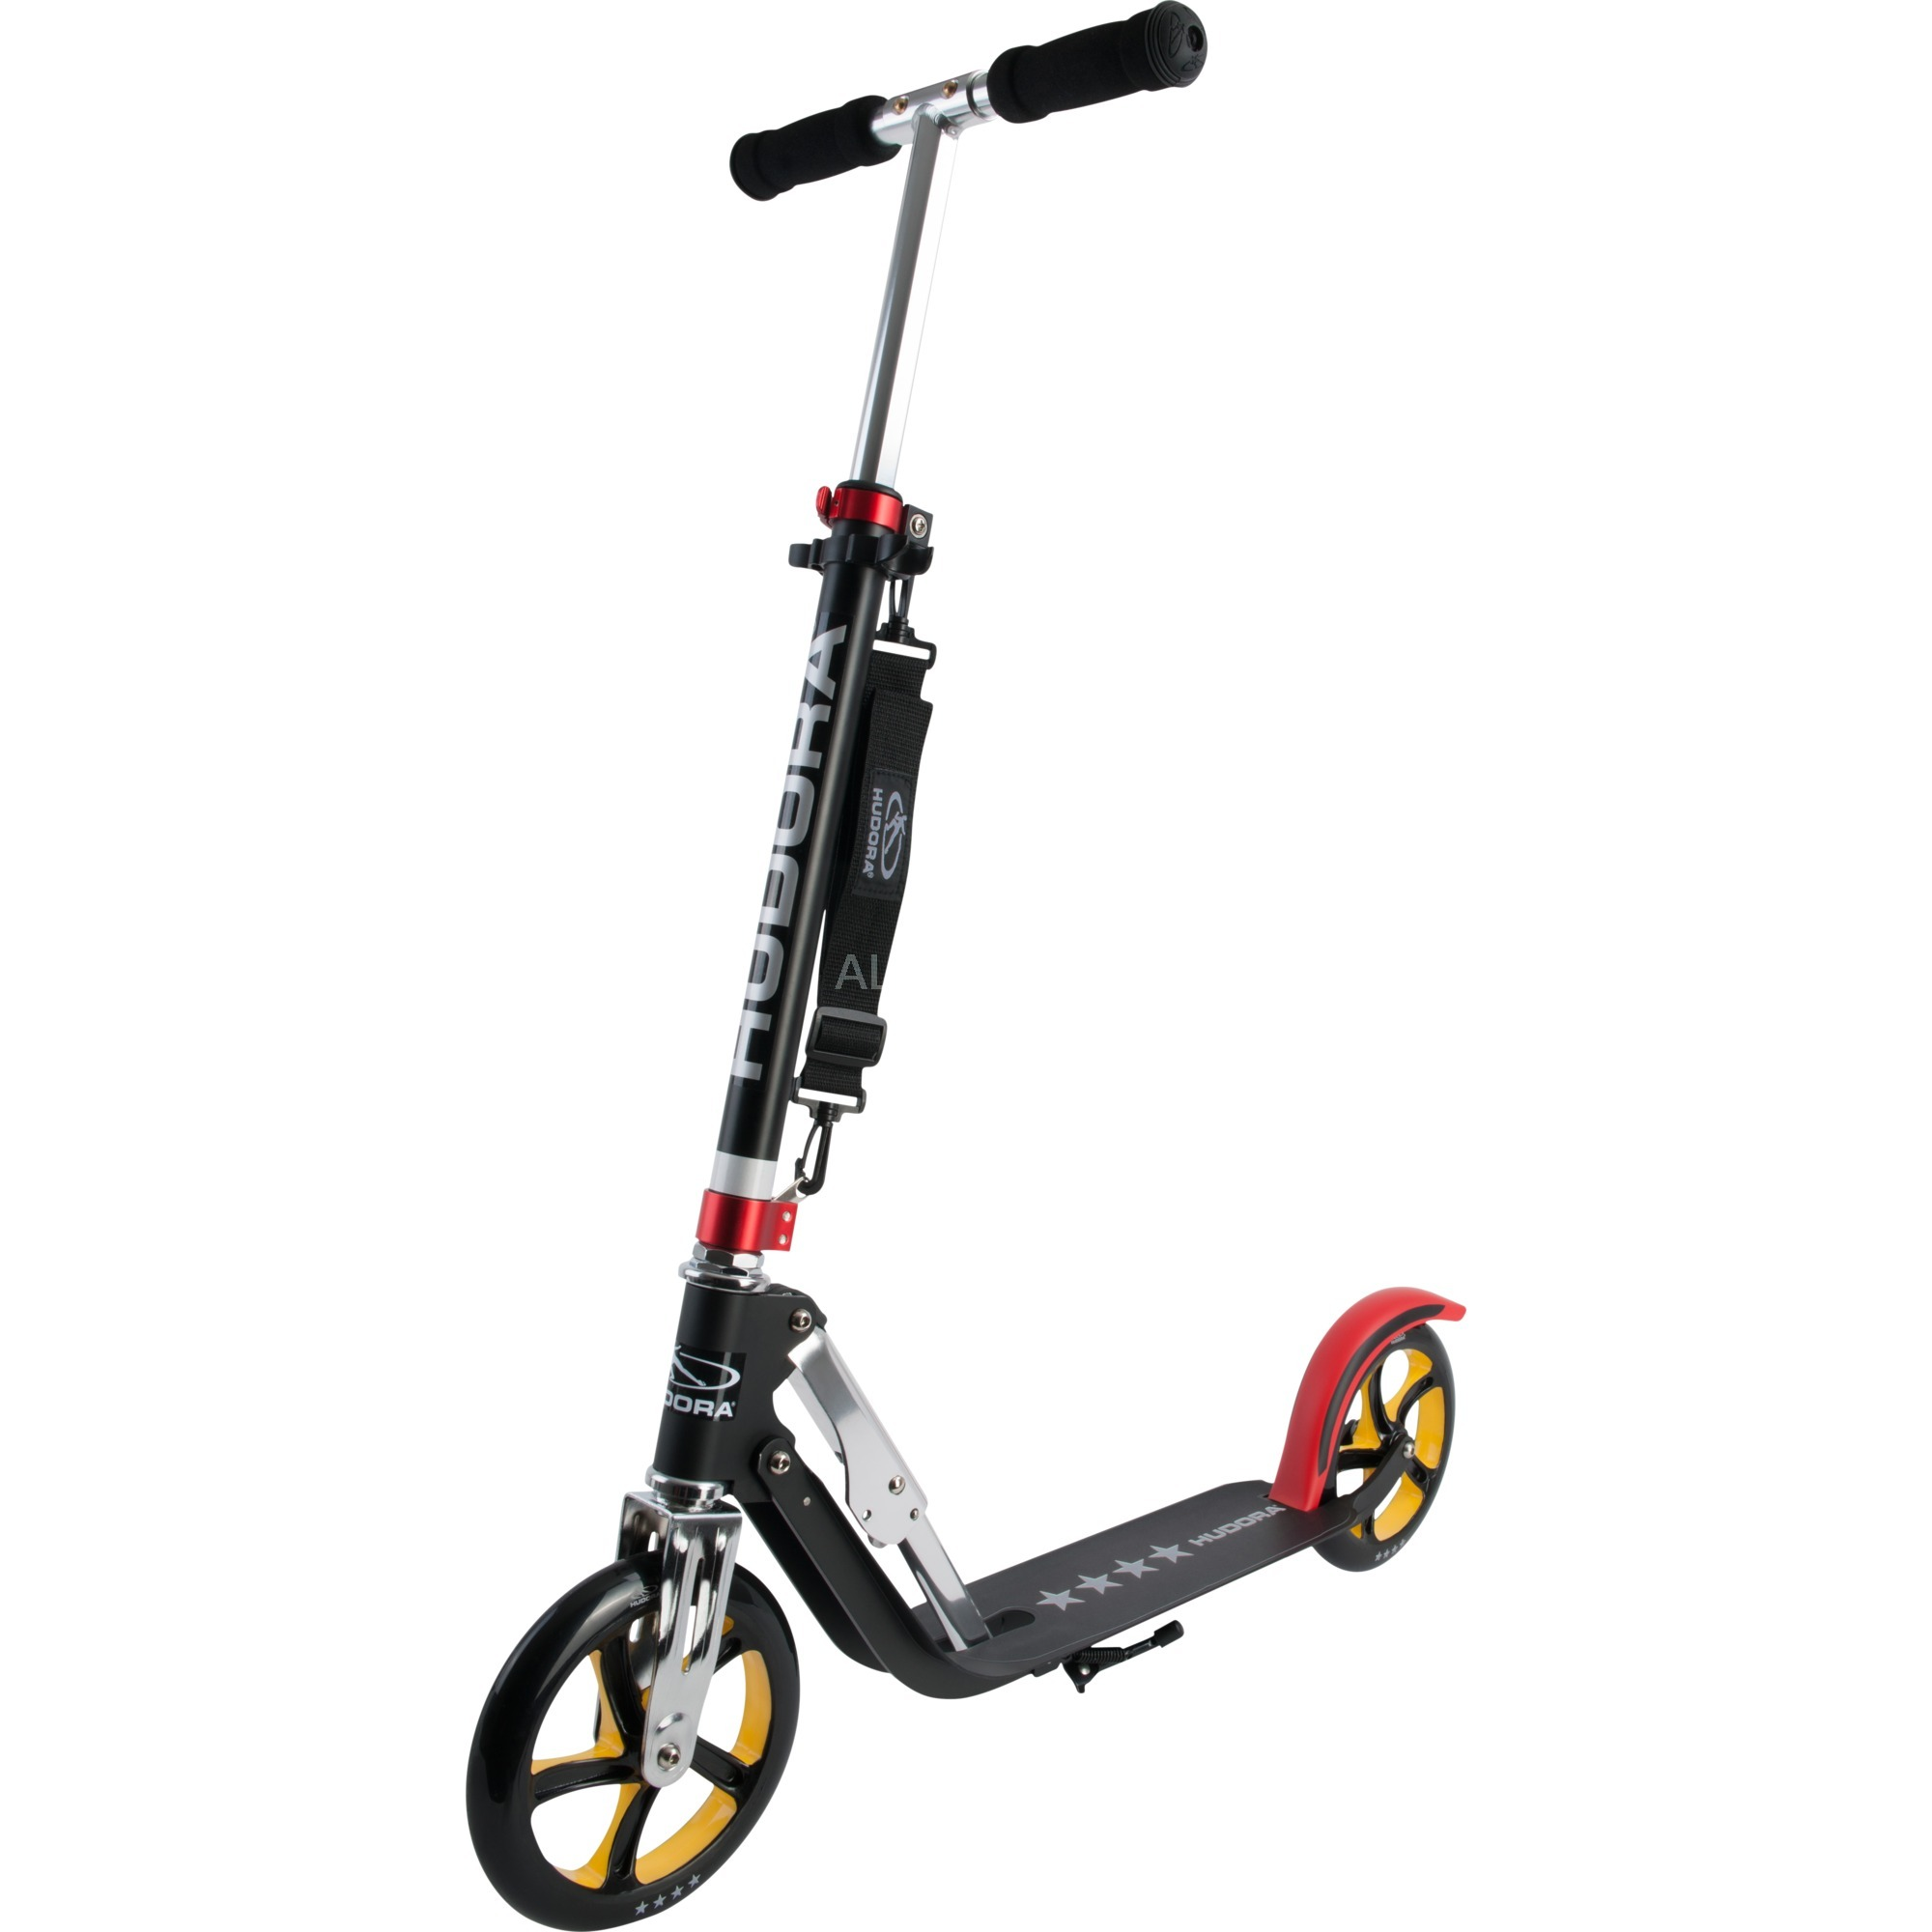 14759 scooter Adultos Negro, Oro, Rojo, Vespa